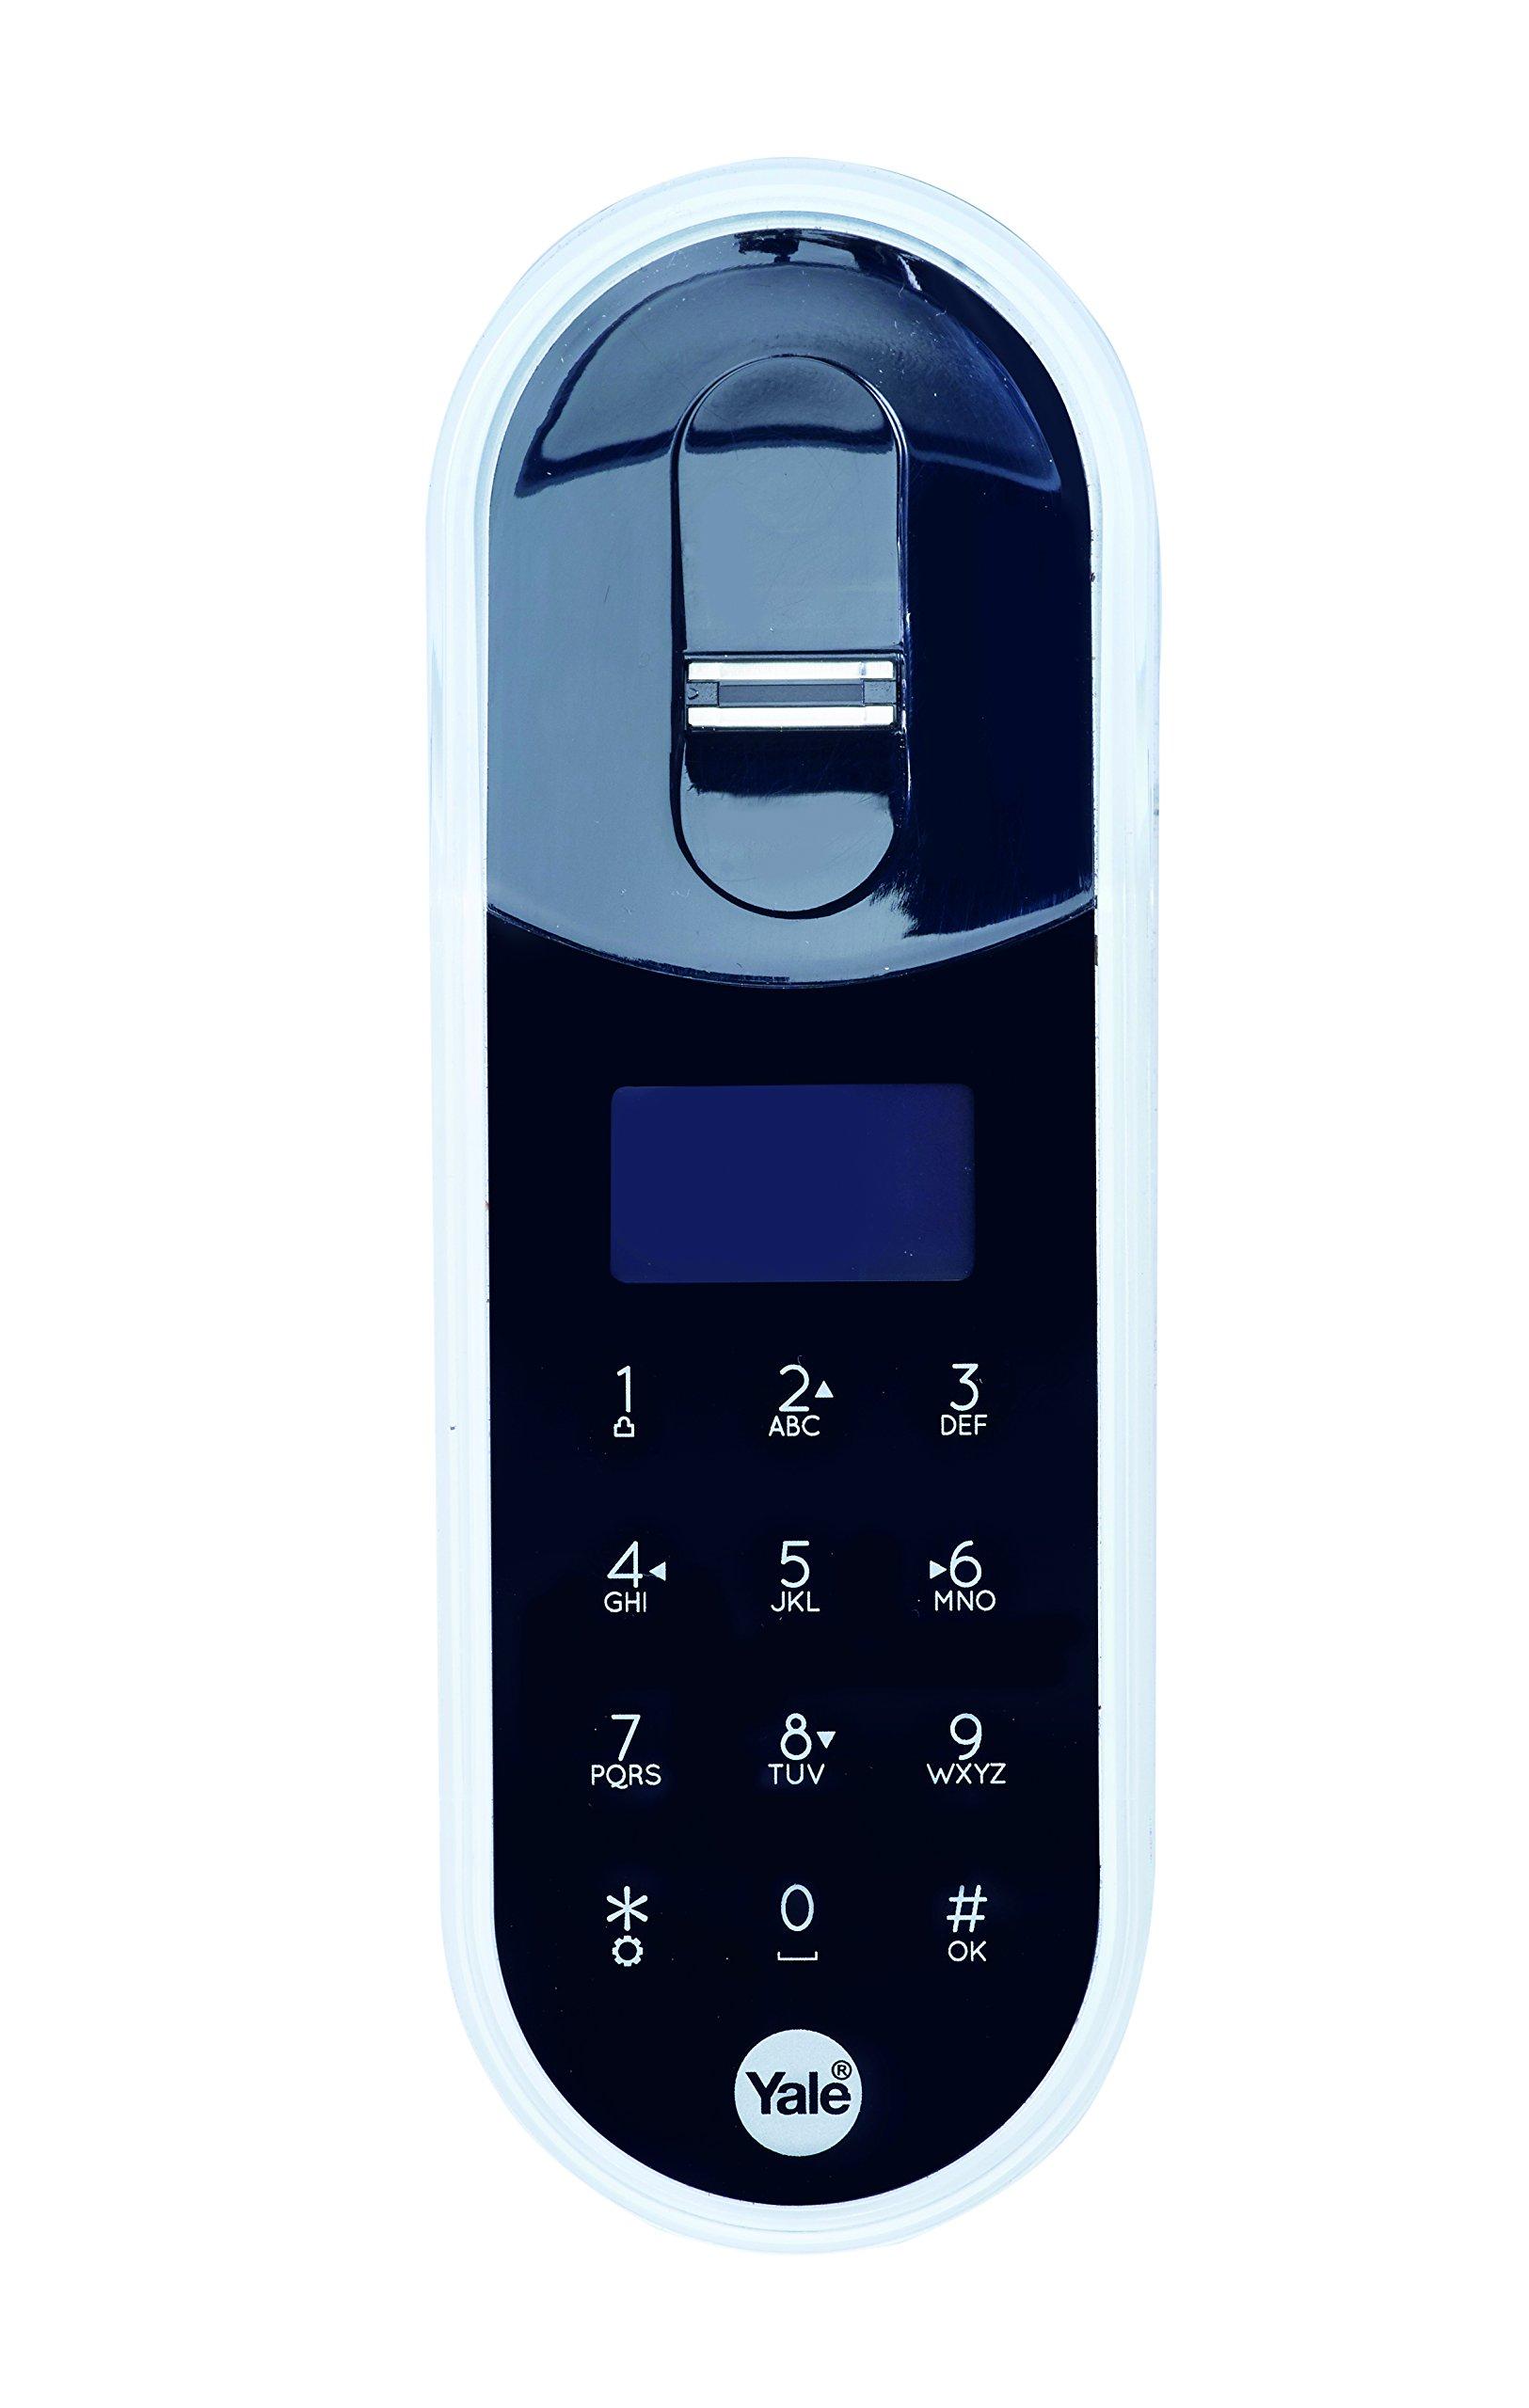 Yale Touchpad Reader Digital Fingerprint Reader for Connected Lock